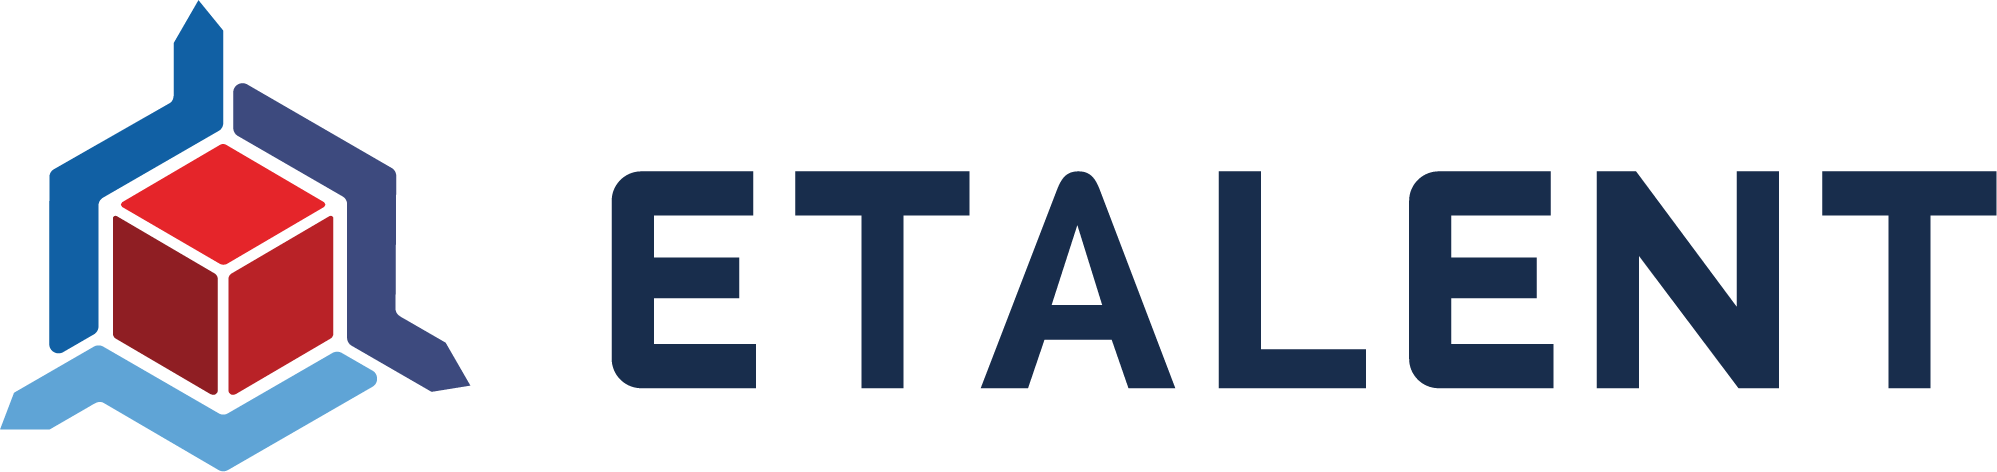 Logotipo ETALENT Colorido